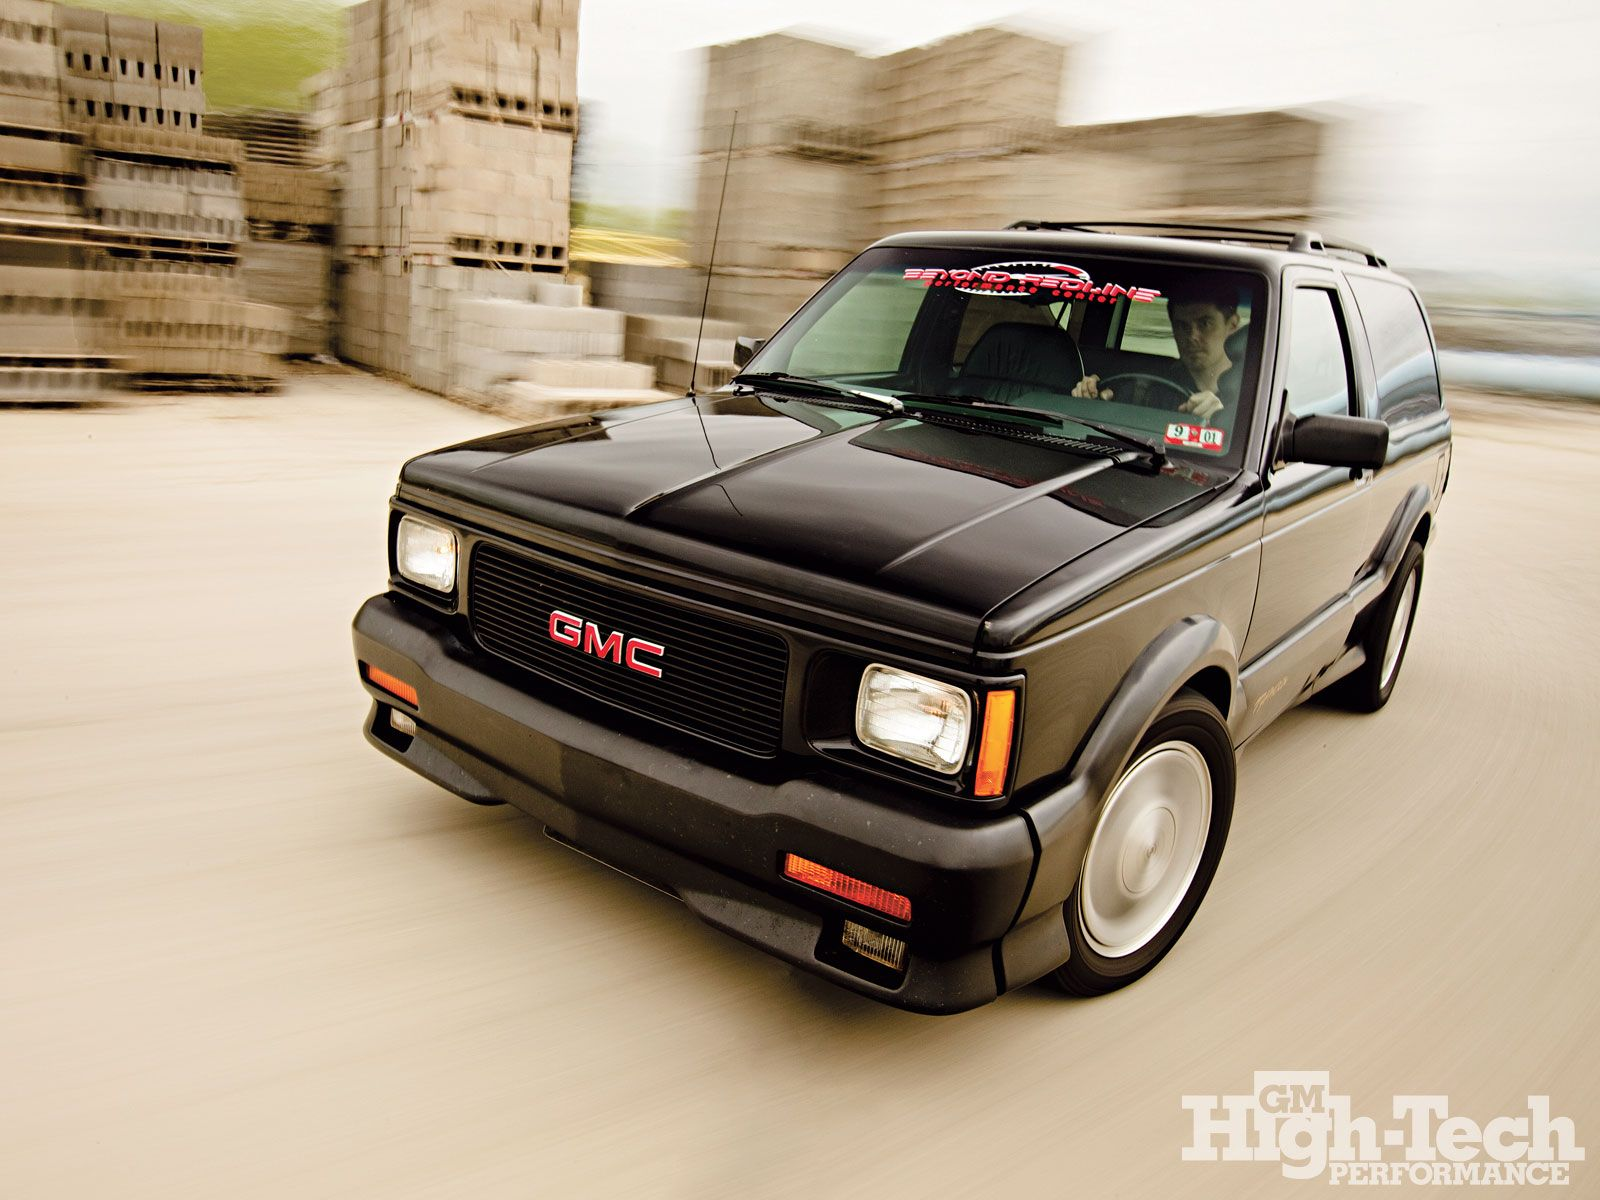 gmc typhoon my all time favorite car Gmc, Car, Trucks